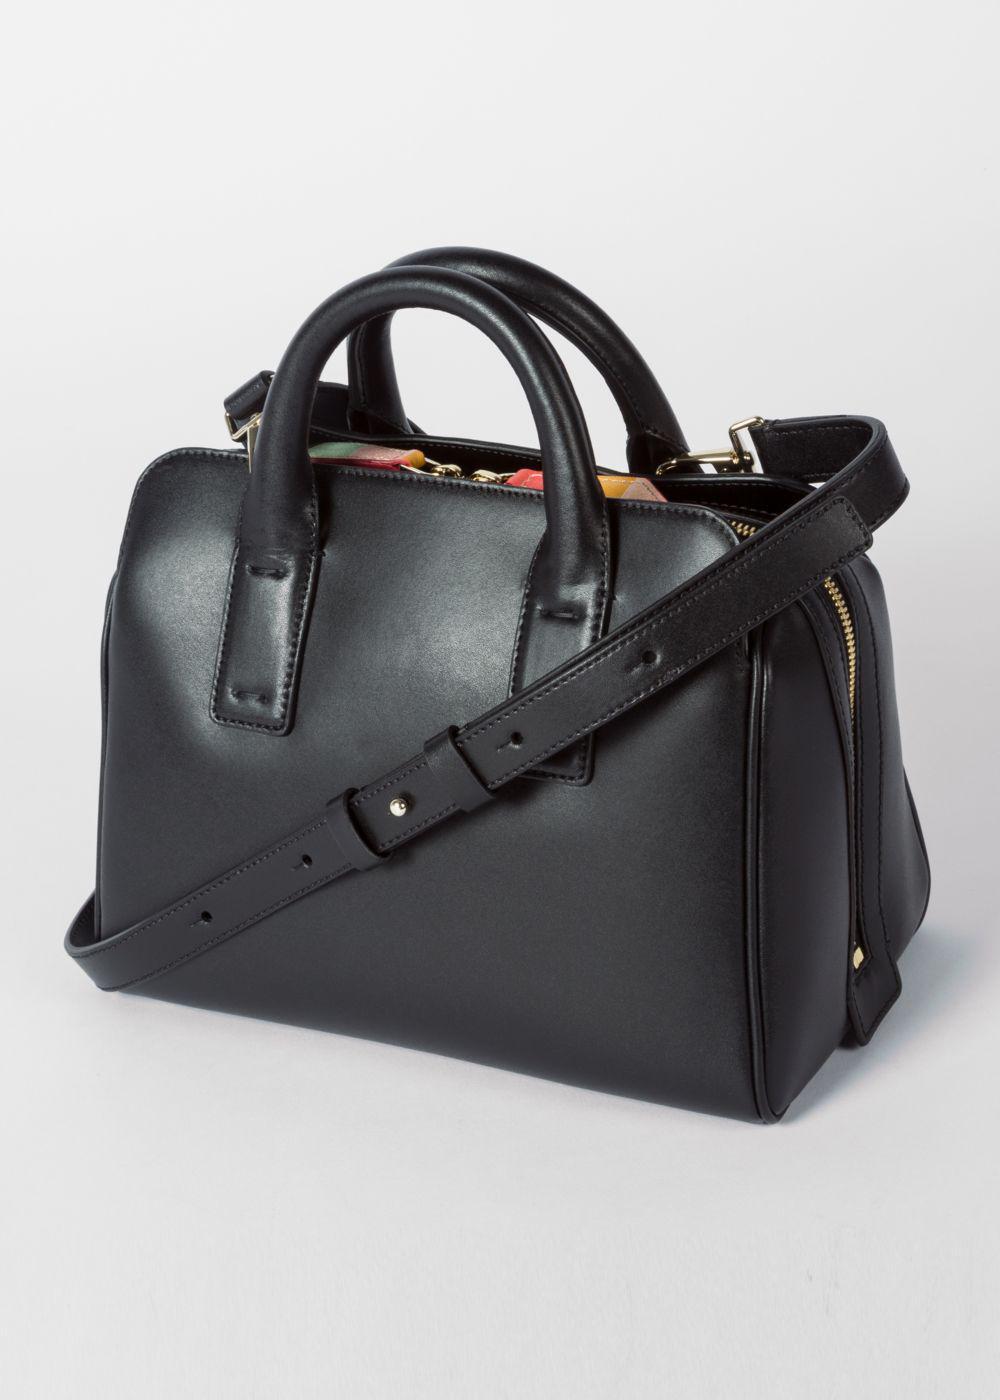 3d99d85c67f7 Paul Smith Women s Black Leather Mini Bowling Bag With  artist ...